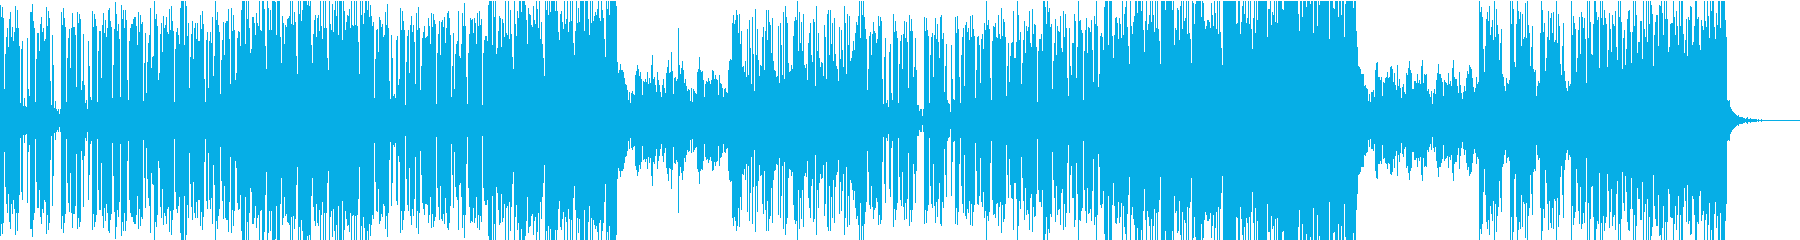 darkwave electroの再生済みの波形